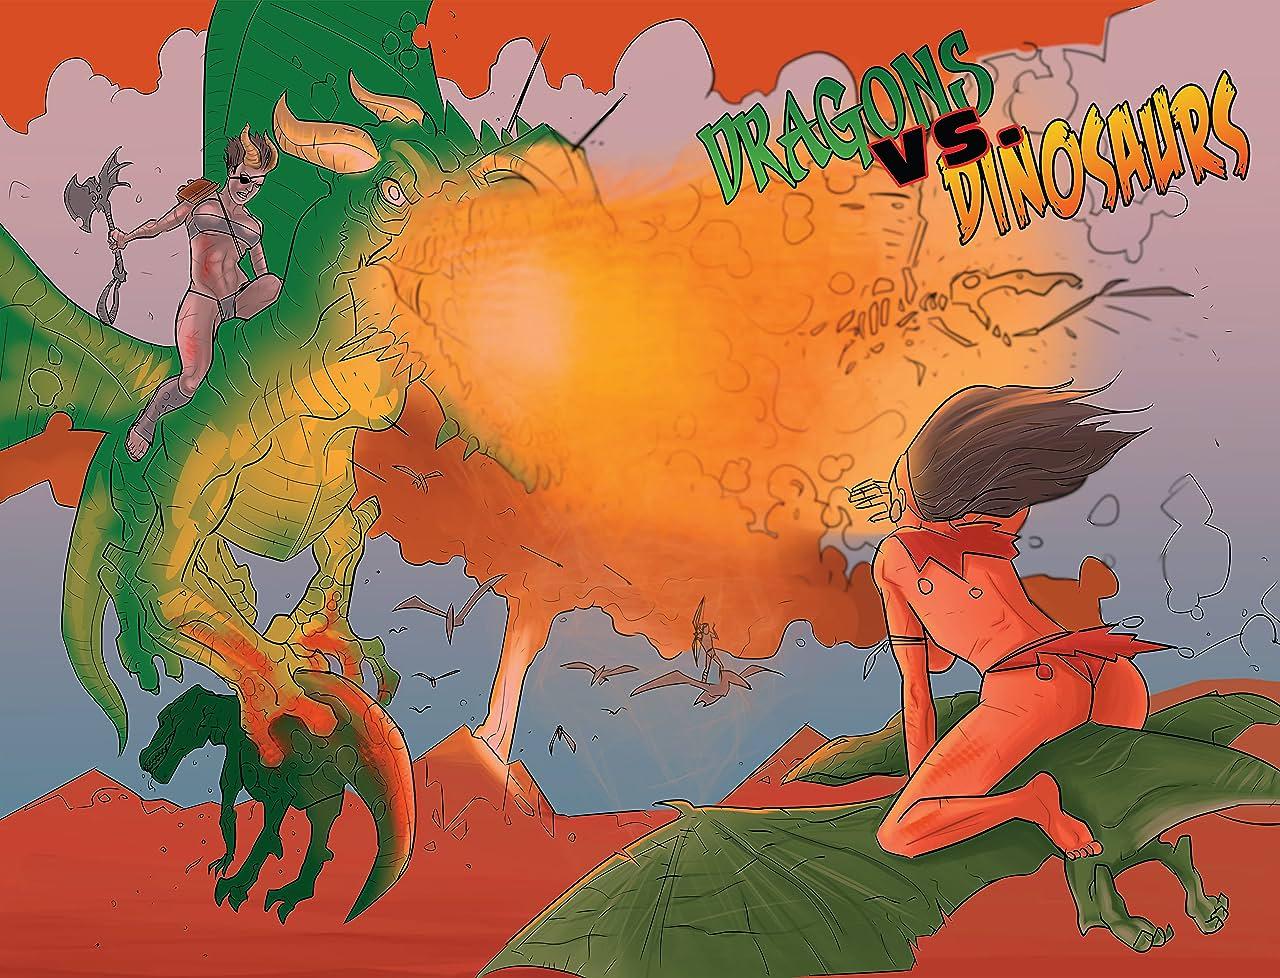 Dragons vs. Dinosaurs #1